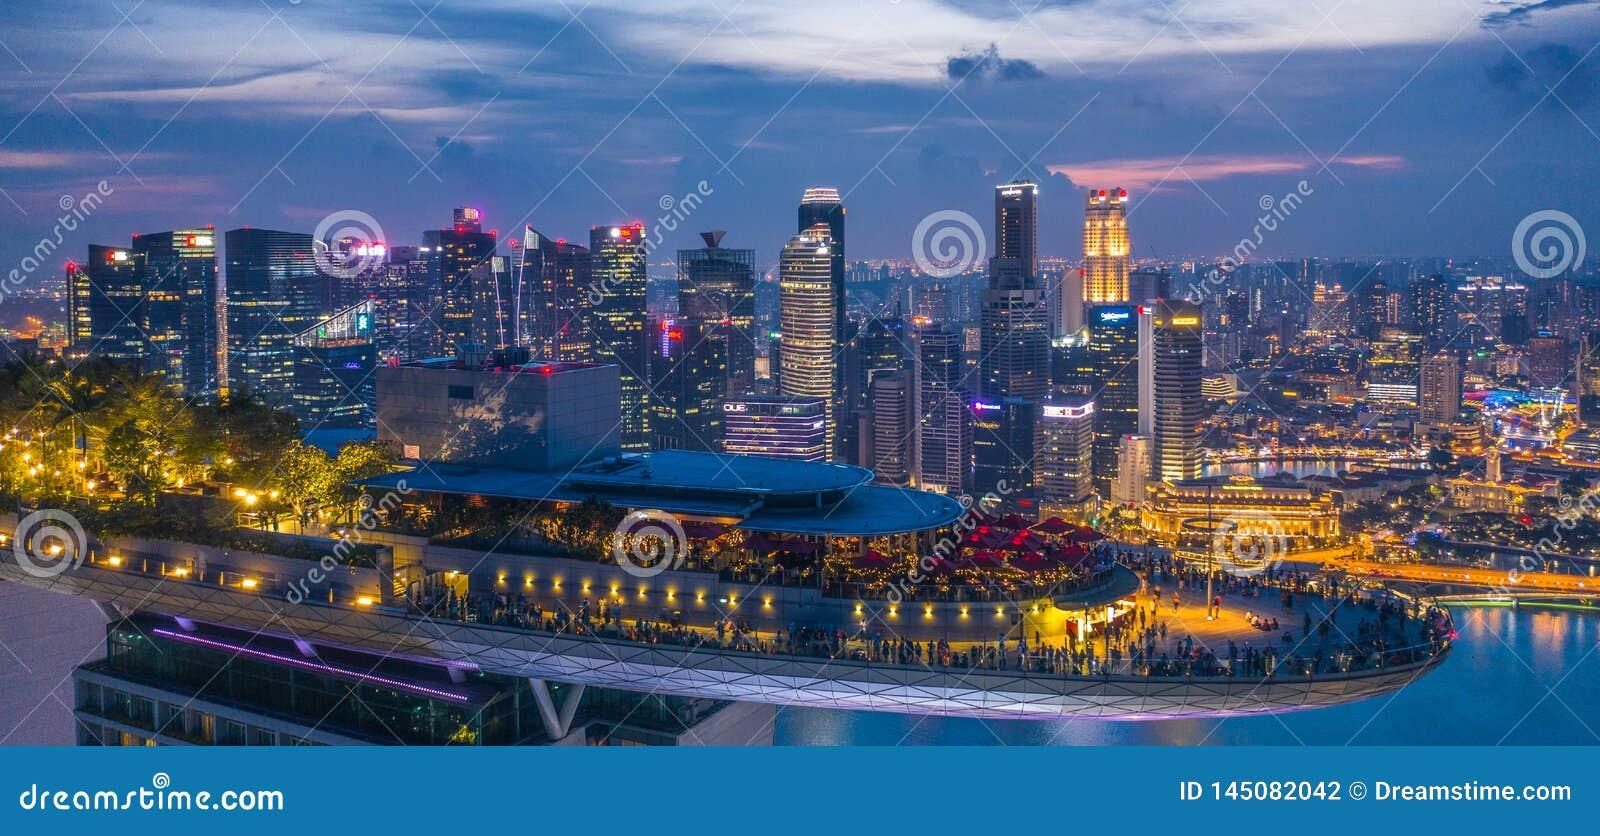 Marina Bay Hotel Skypark Skygarden Skybar in Singapur - Raumschiff